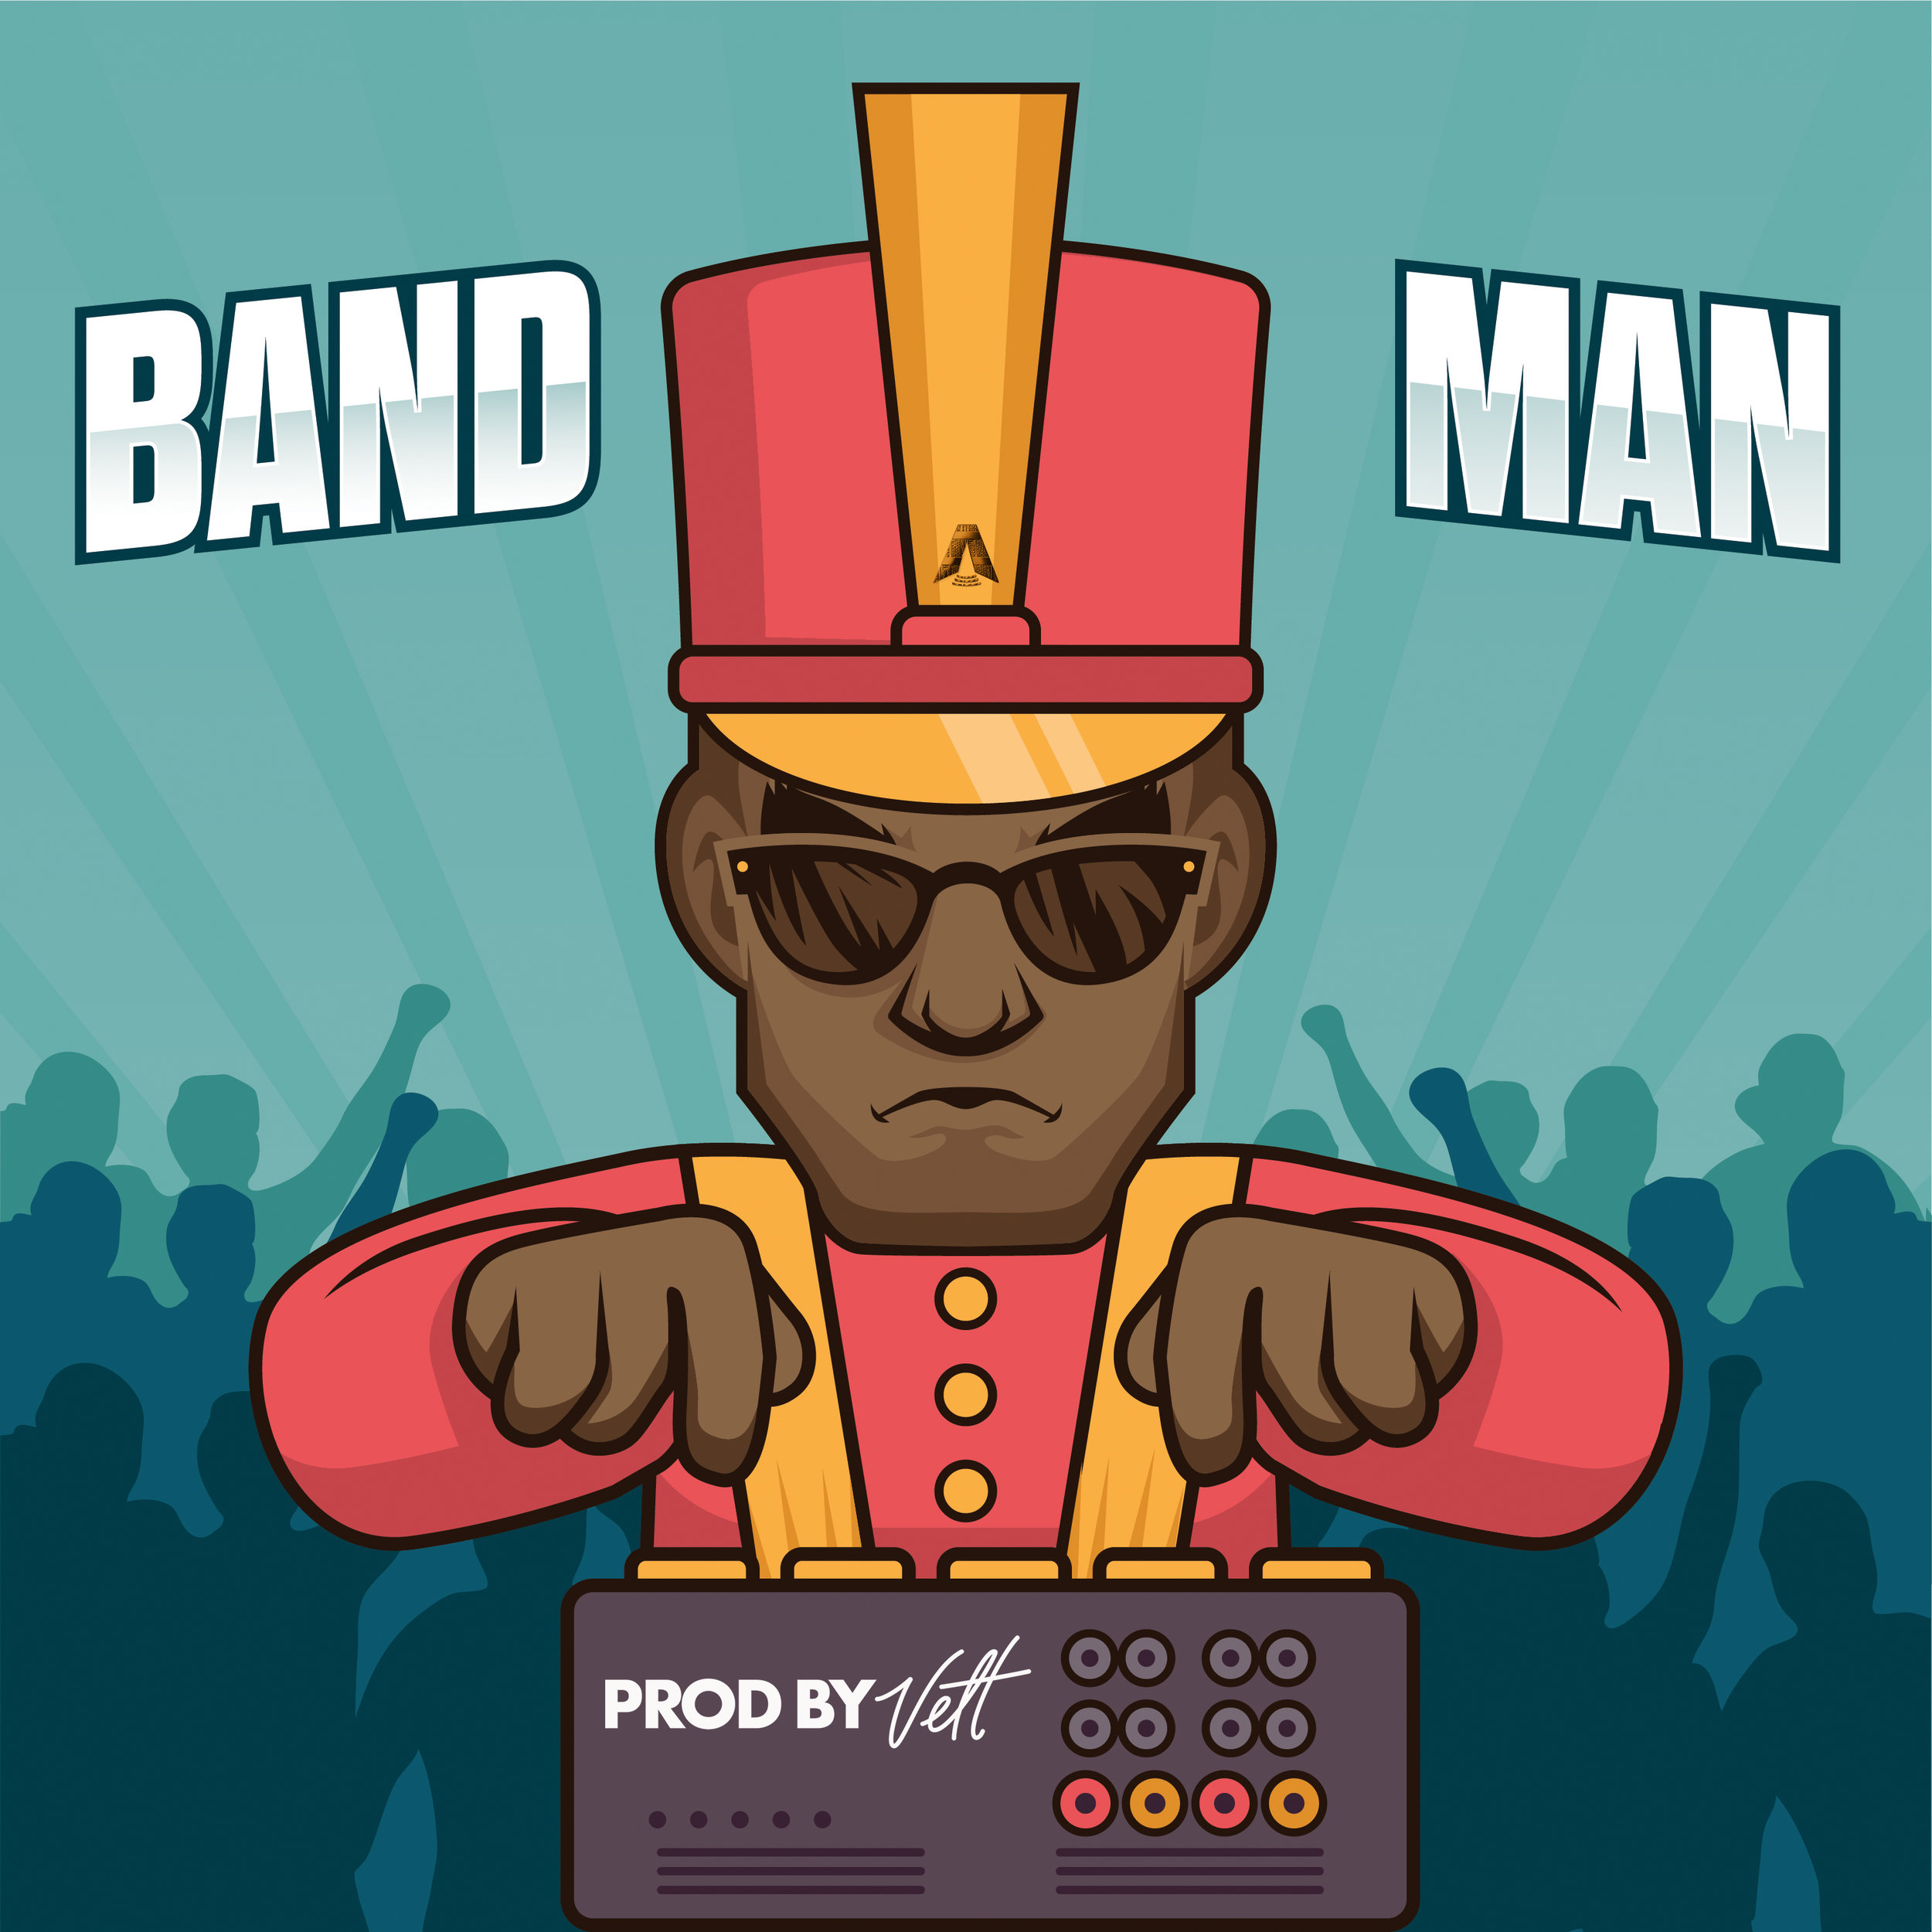 band man.jpg